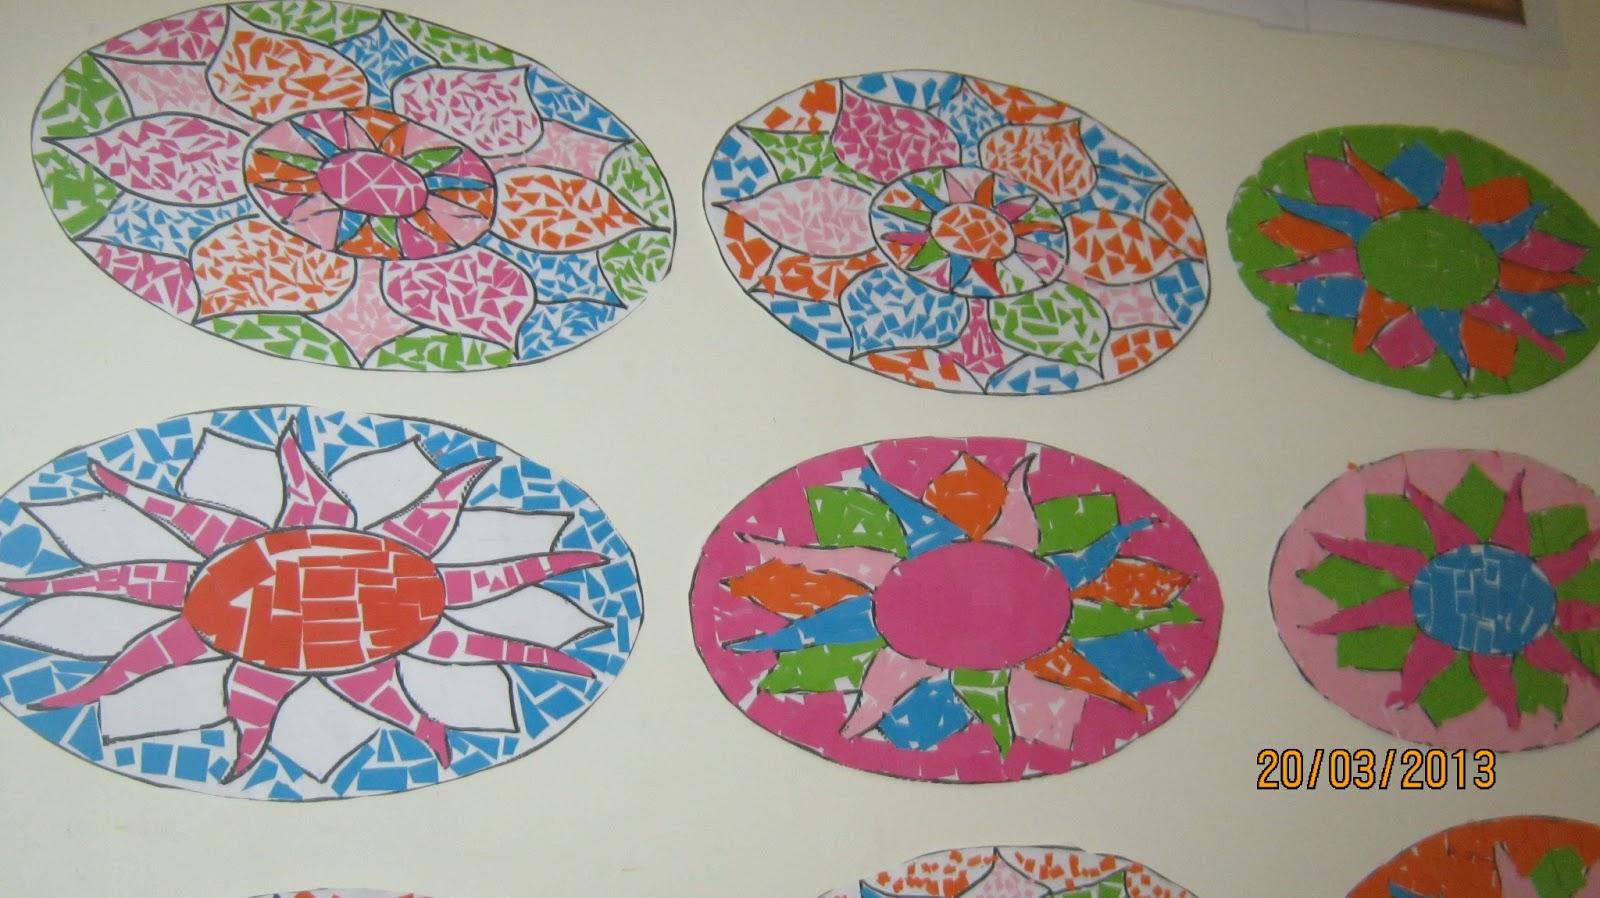 roman mosaic templates for kids - third and fourth class blog roman mosaic artwork